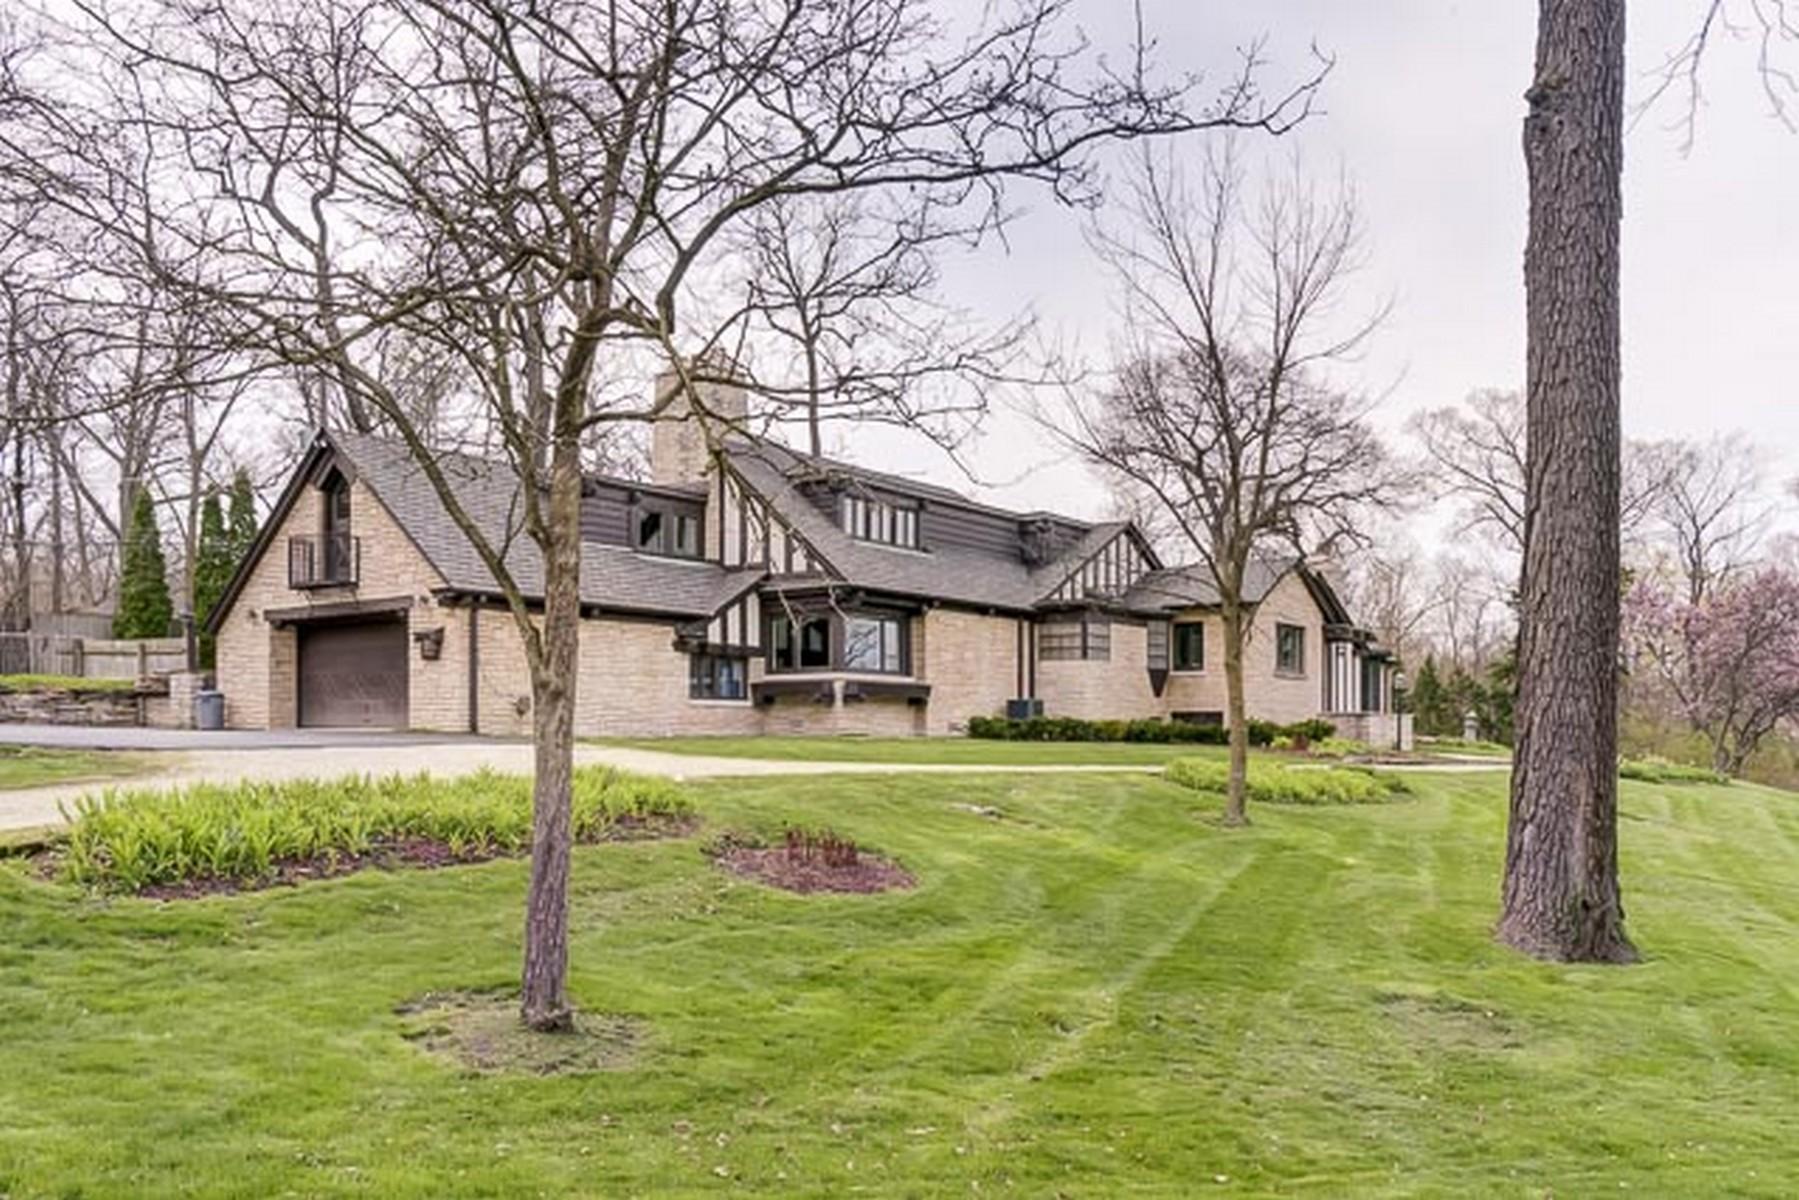 Nhà ở một gia đình vì Bán tại Indiana Limestone Tudor on 1.75 Acres 1340 Maple Avenue Downers Grove, Illinois, 60515 Hoa Kỳ